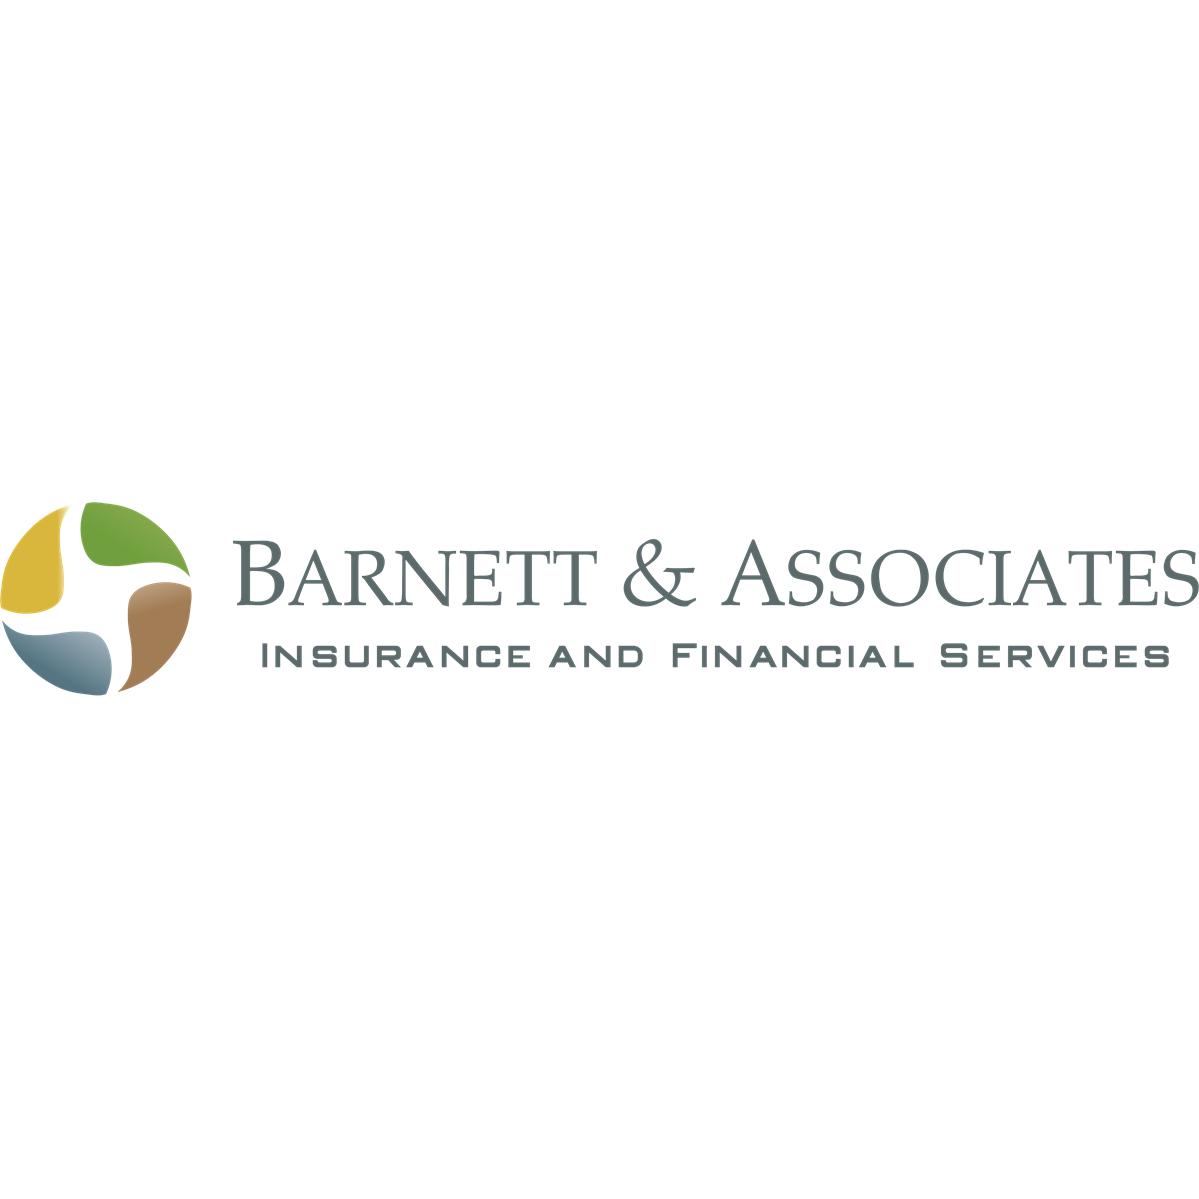 Barnett and Associates